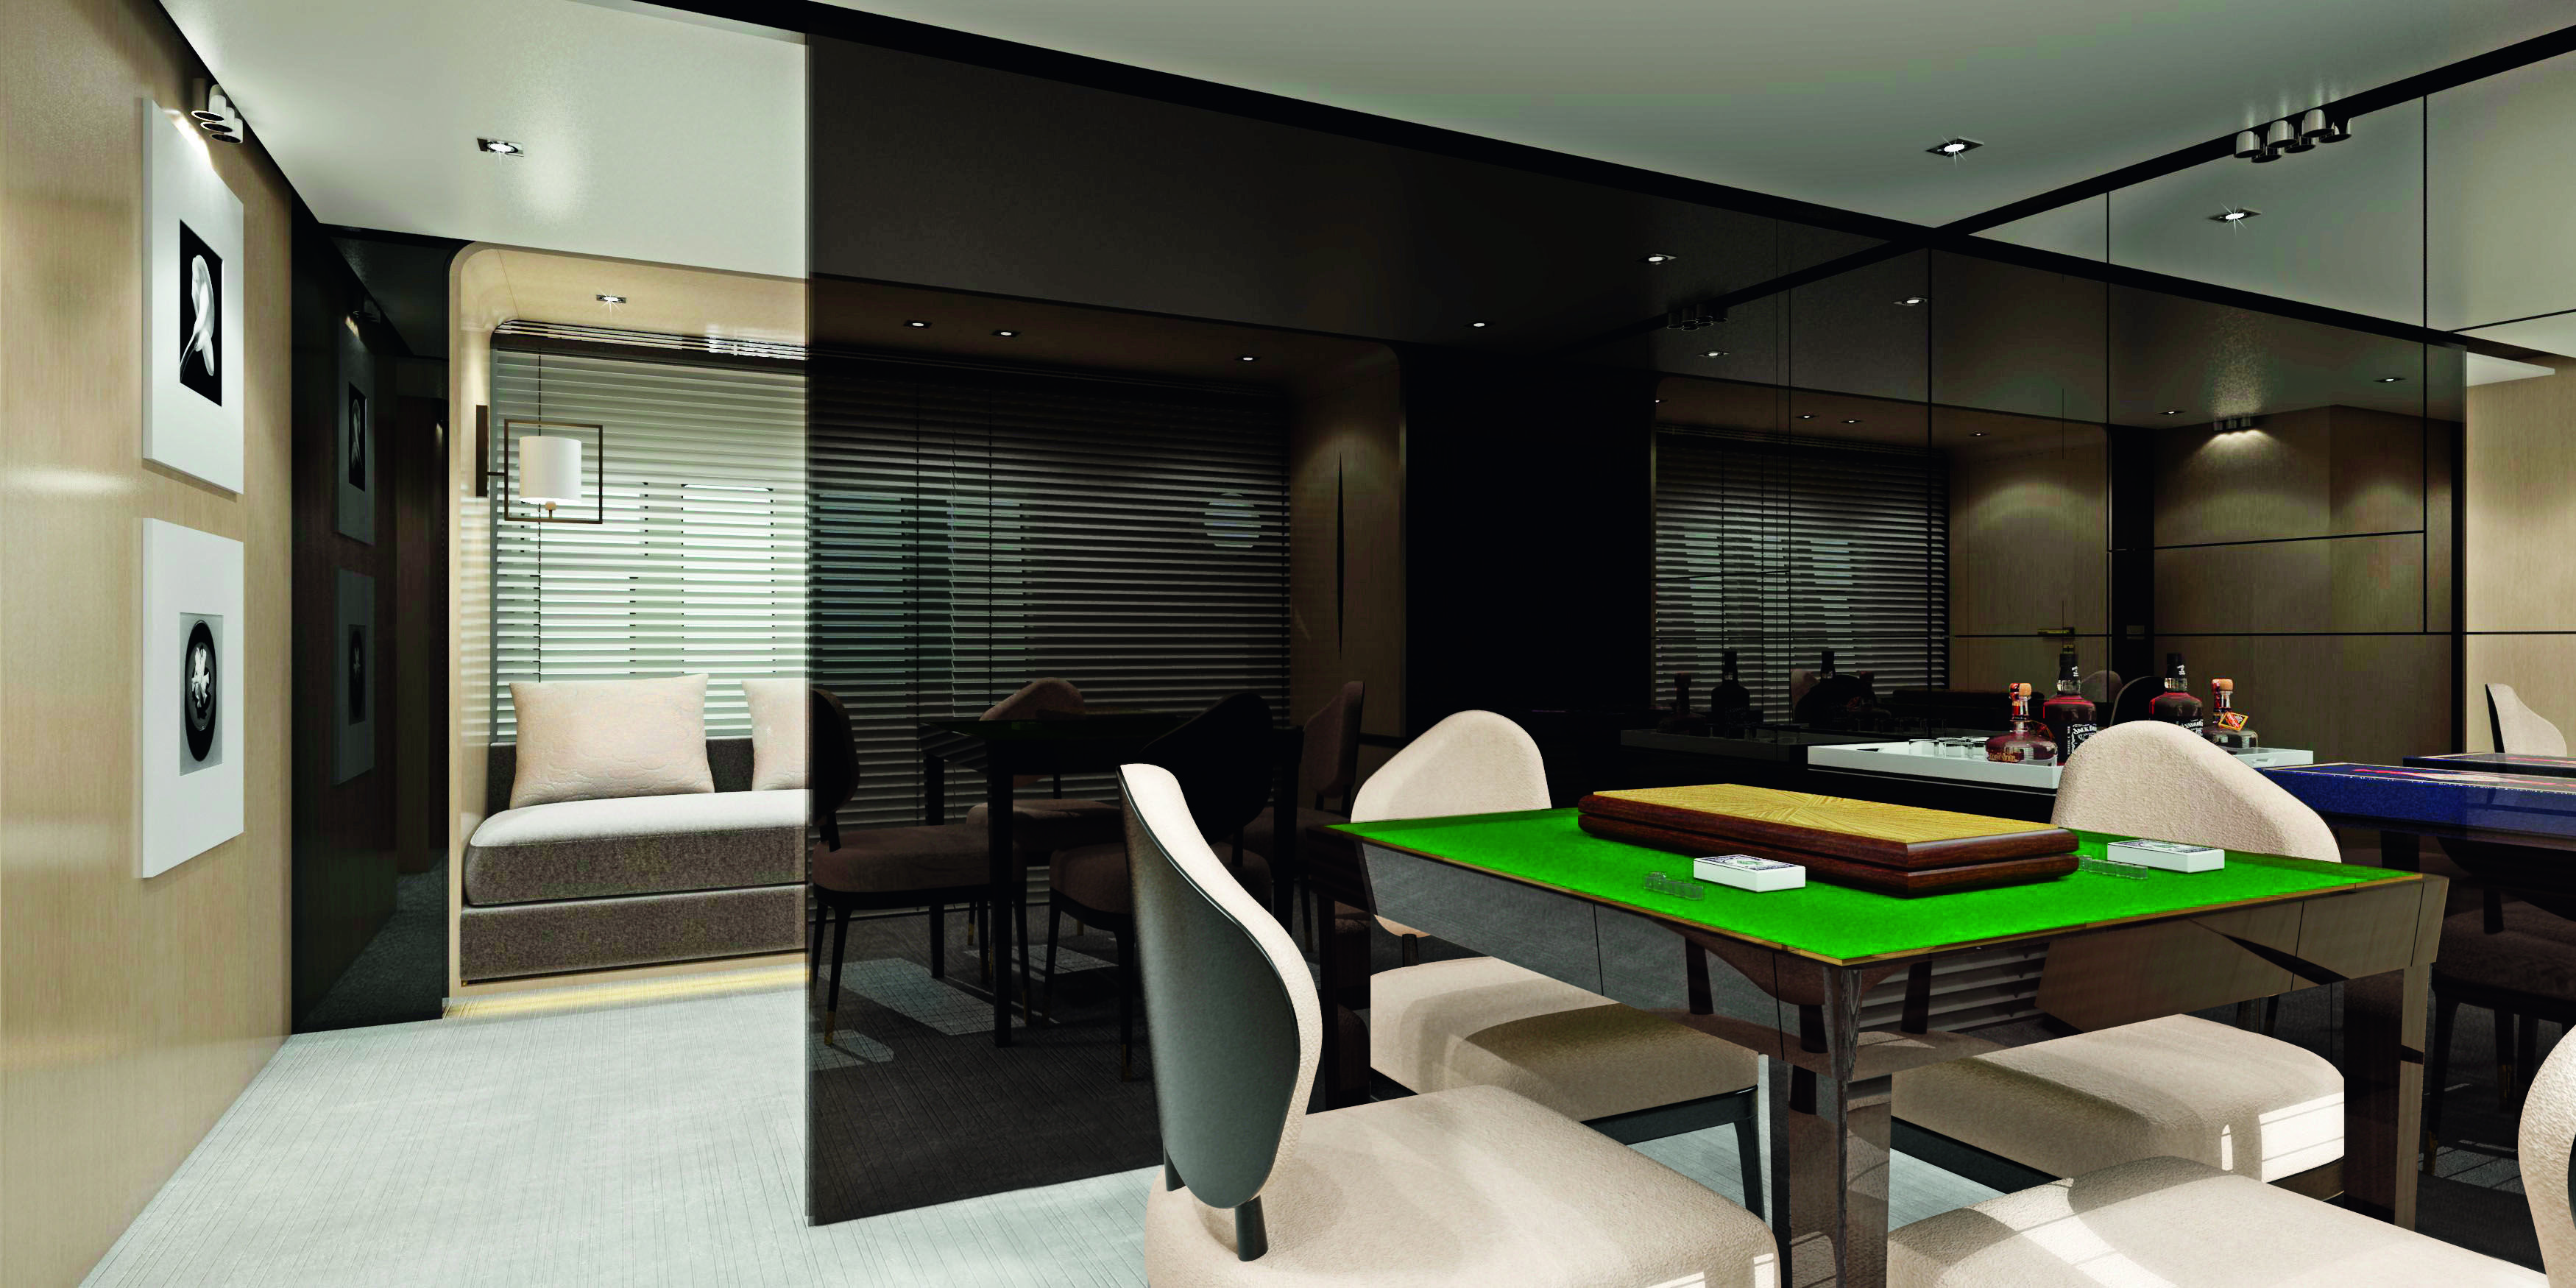 Yacht interior design azimut 88 dragon mahjong karaoke for Design room karaoke